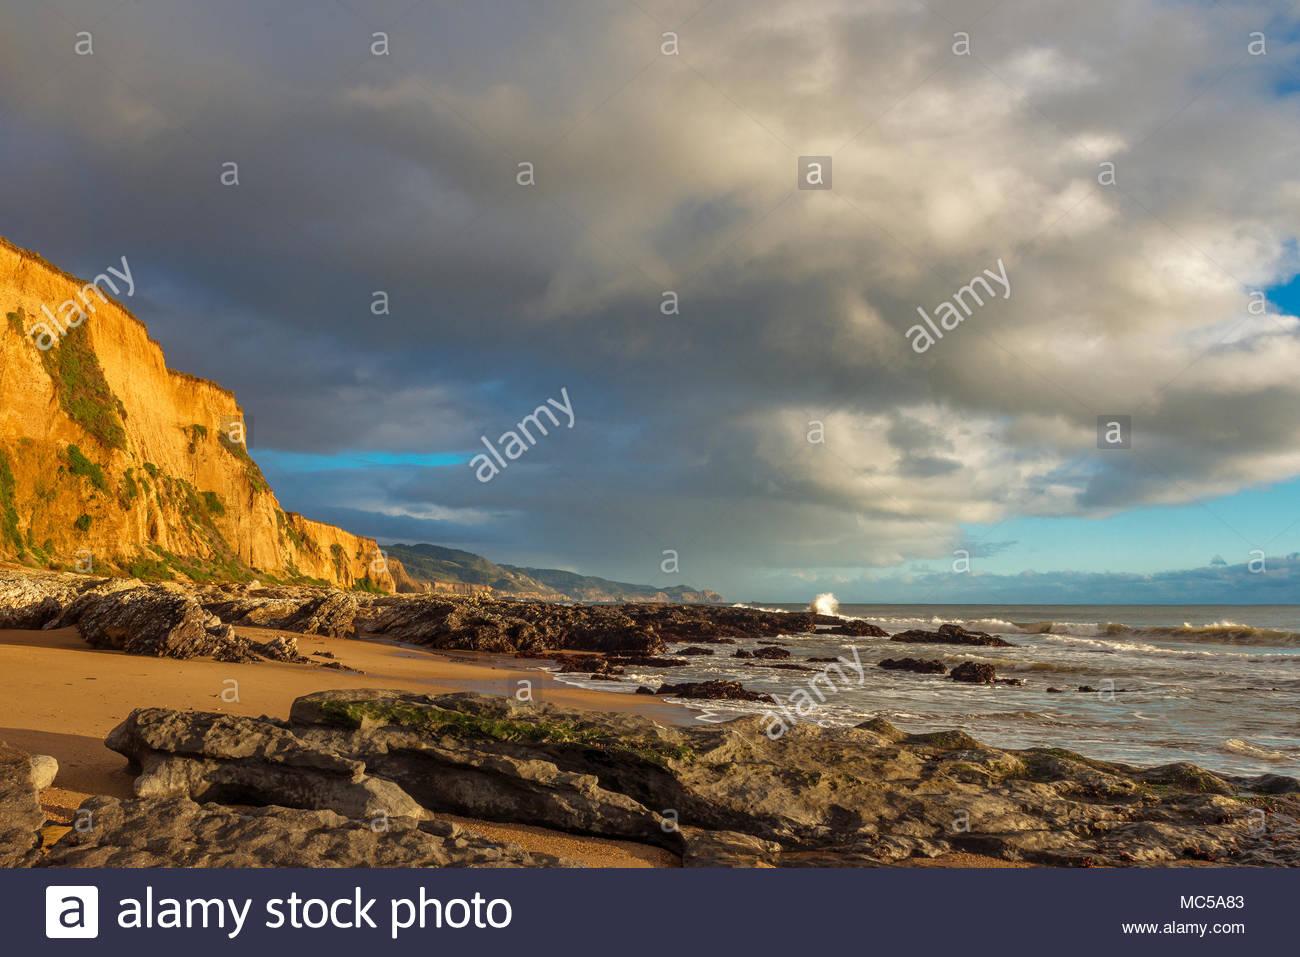 Sculptured Beach, Burton Wilderness, Point Reyes National Seashore, Marin County, California - Stock Image